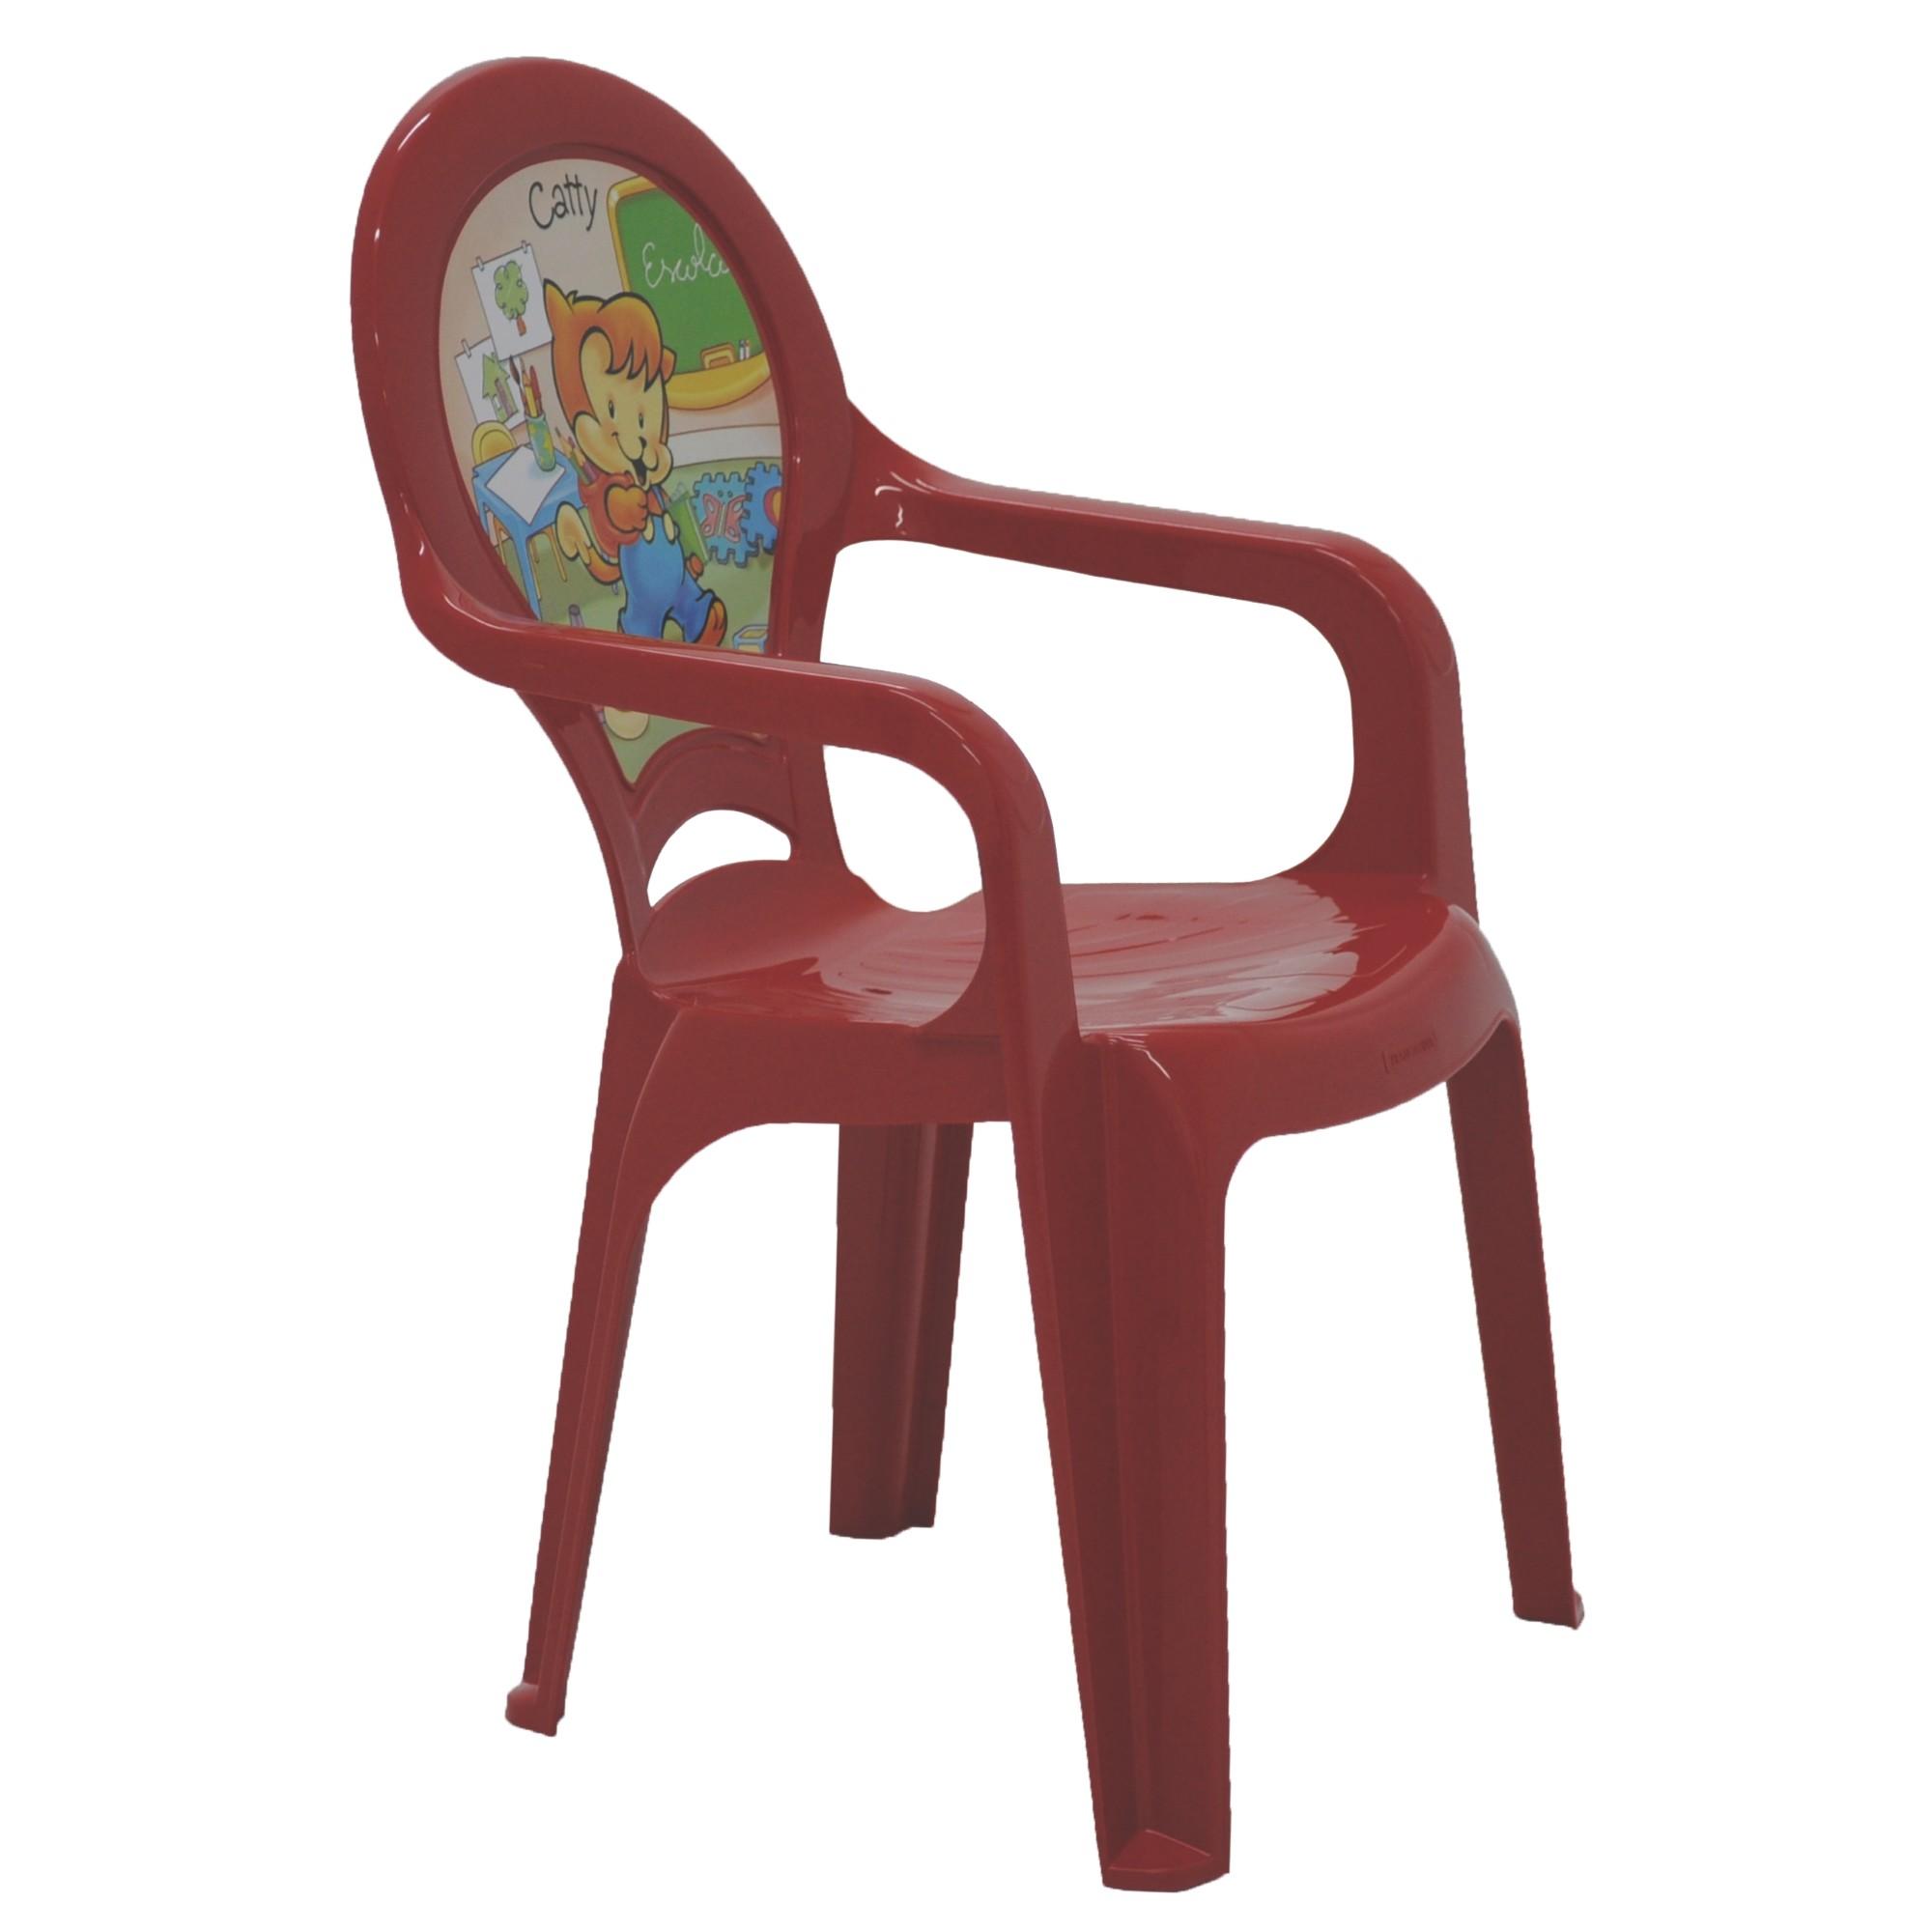 Poltrona de Polipropileno Infantil Vermelha - 92263040 - Tramontina